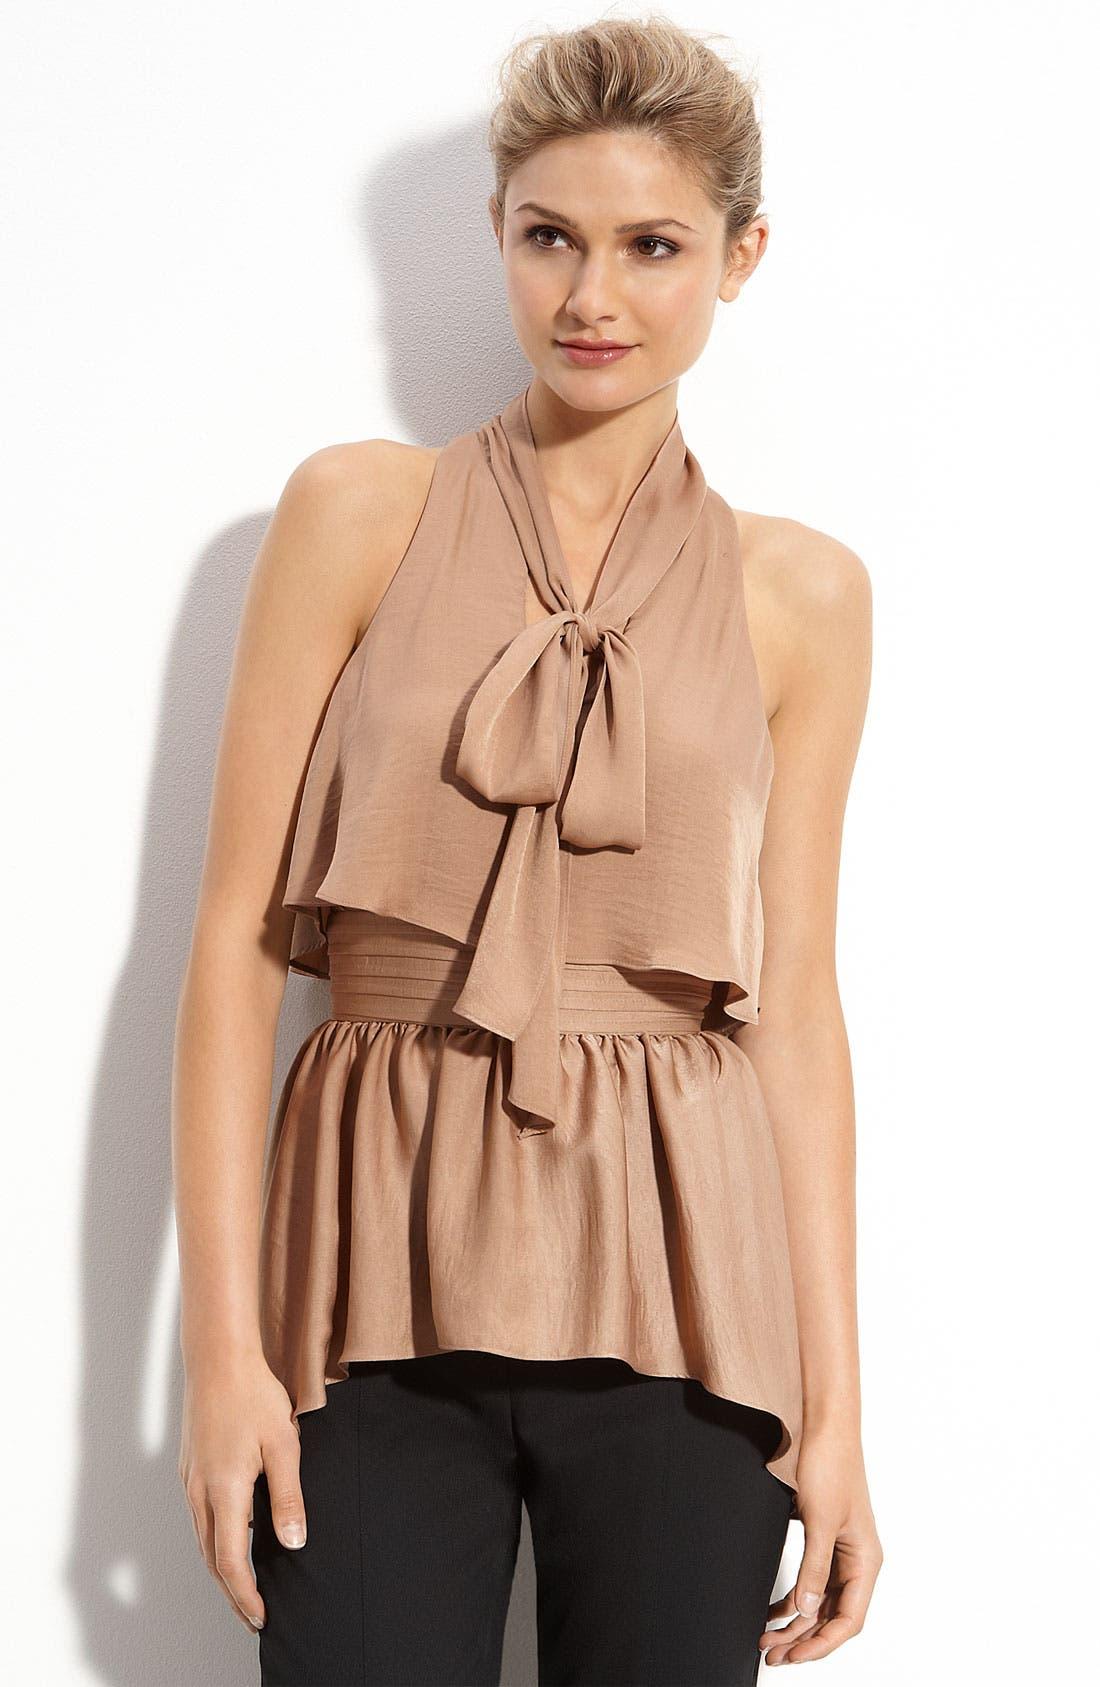 Alternate Image 1 Selected - BCBGMAXAZRIA 'Celline' Tie Neck Top